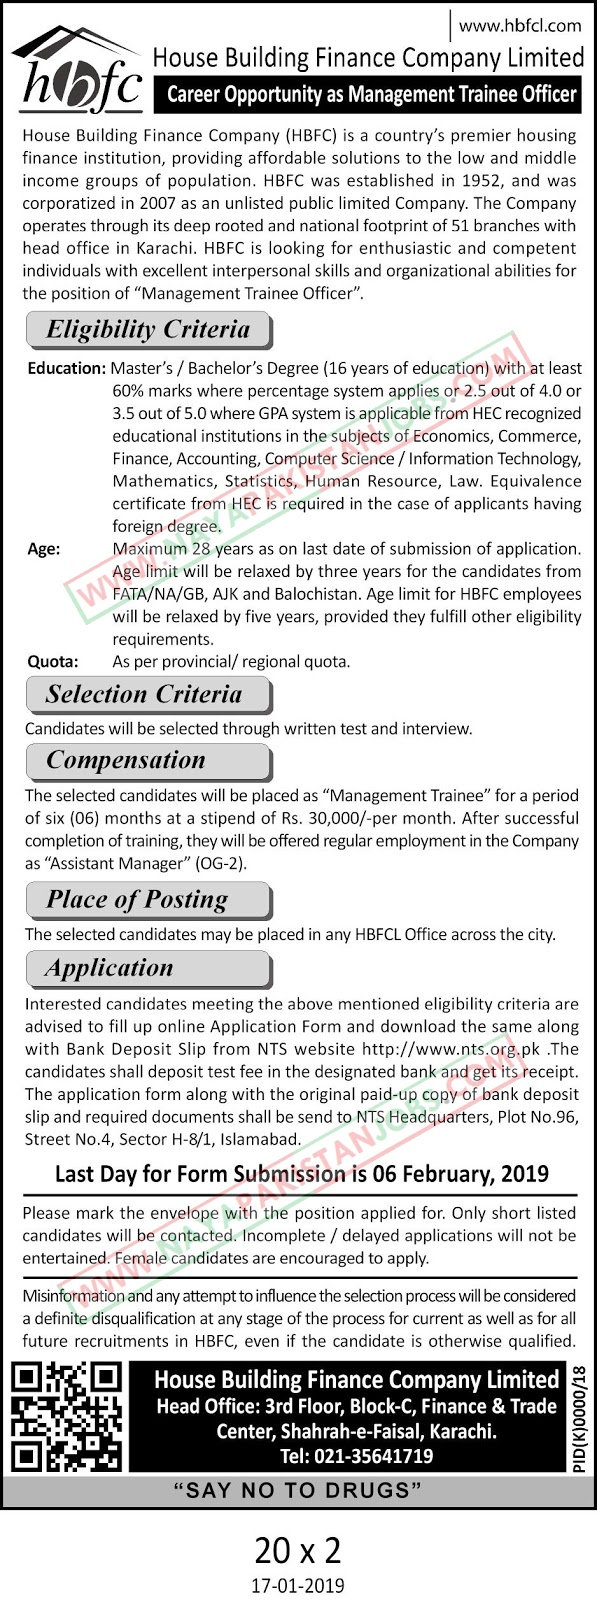 HBFC Jobs 2019, House Building Finance Company HBFC Jobs 2019 Feb | NTS Application form